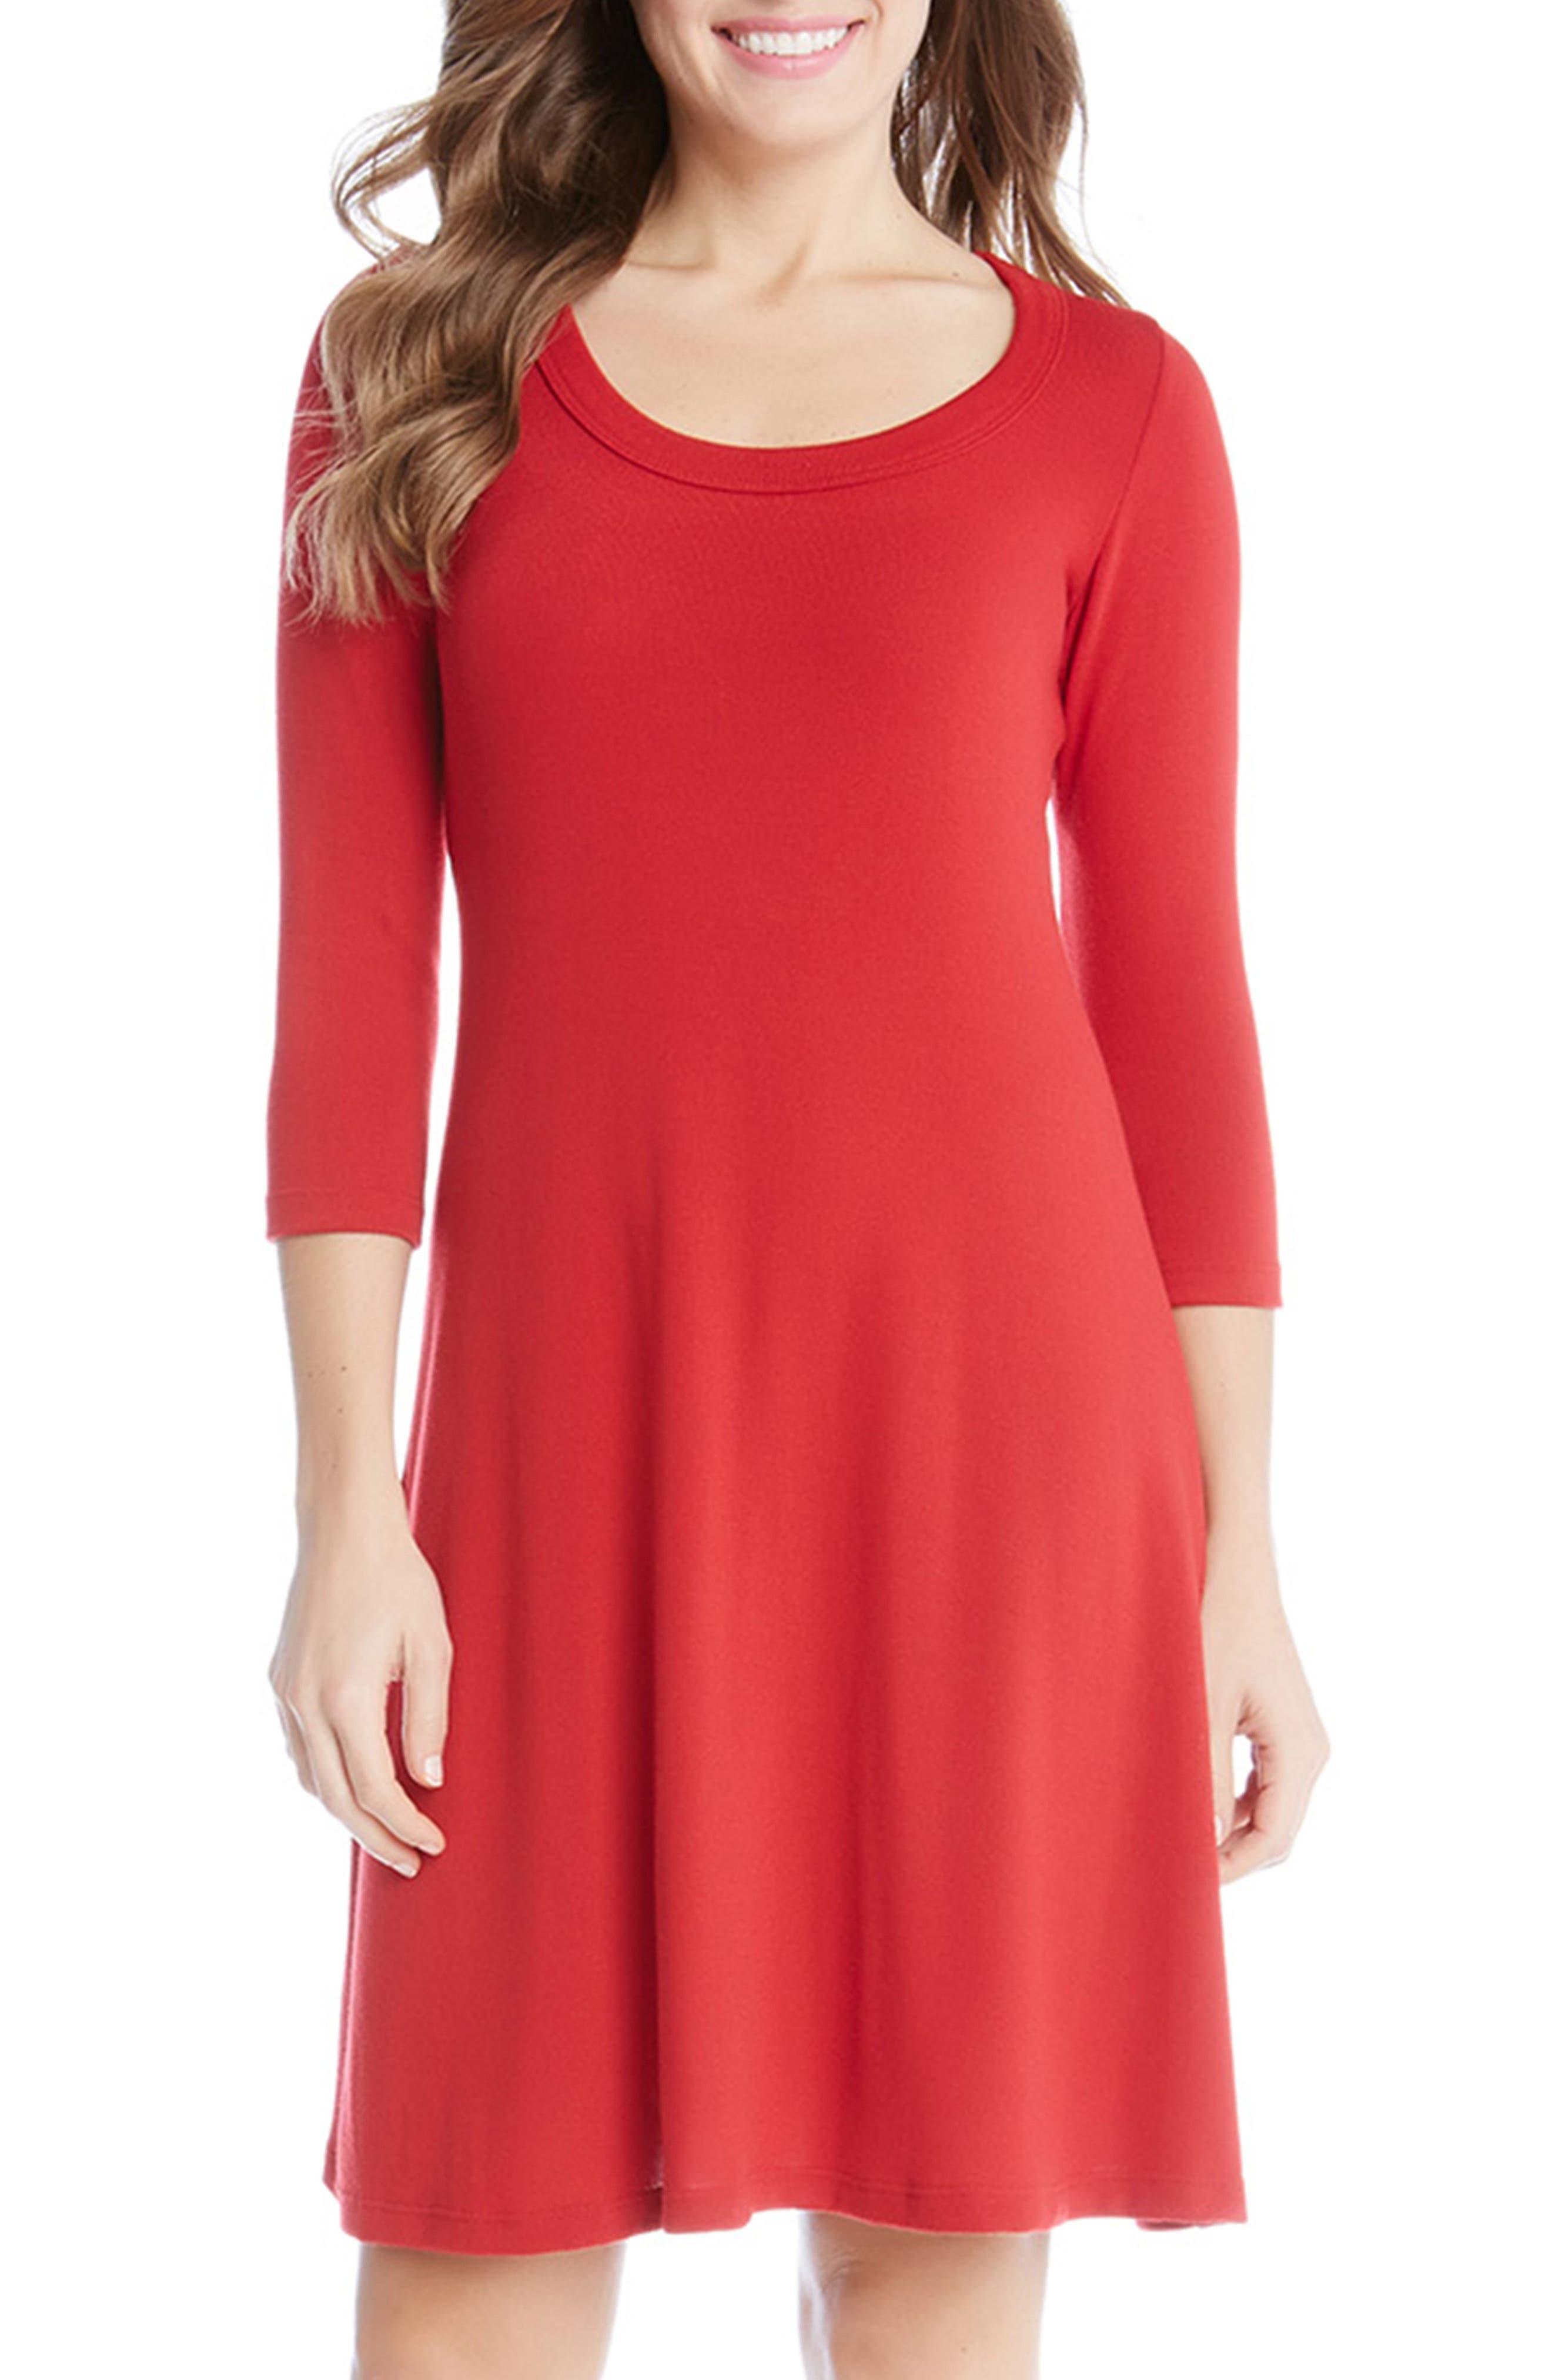 A-Line Sweater Dress,                             Main thumbnail 1, color,                             600